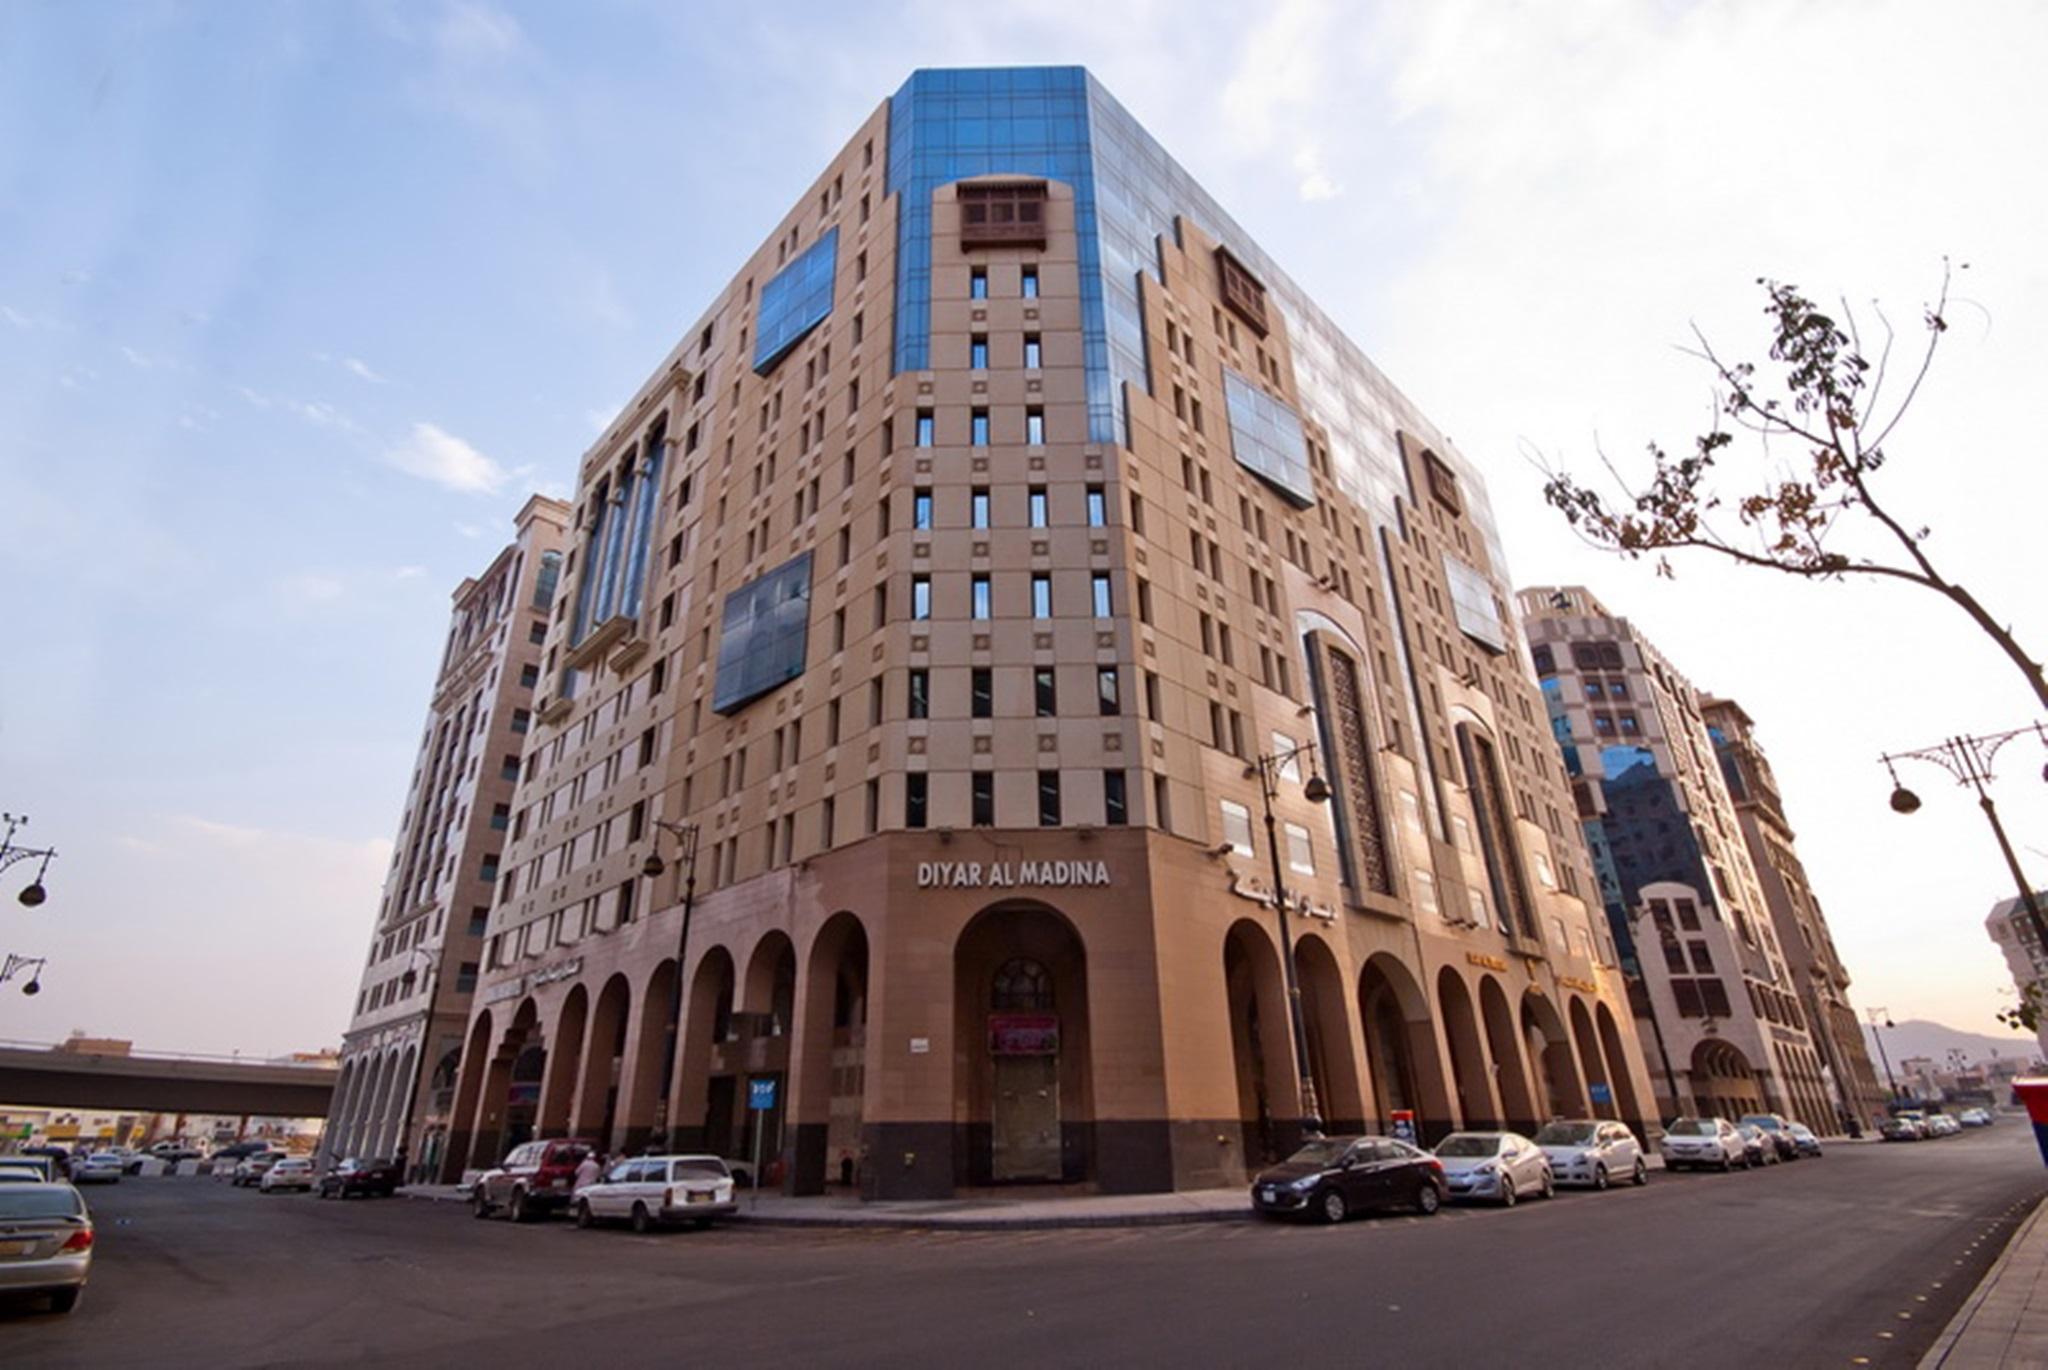 Diyar Al Madinah Hotel,